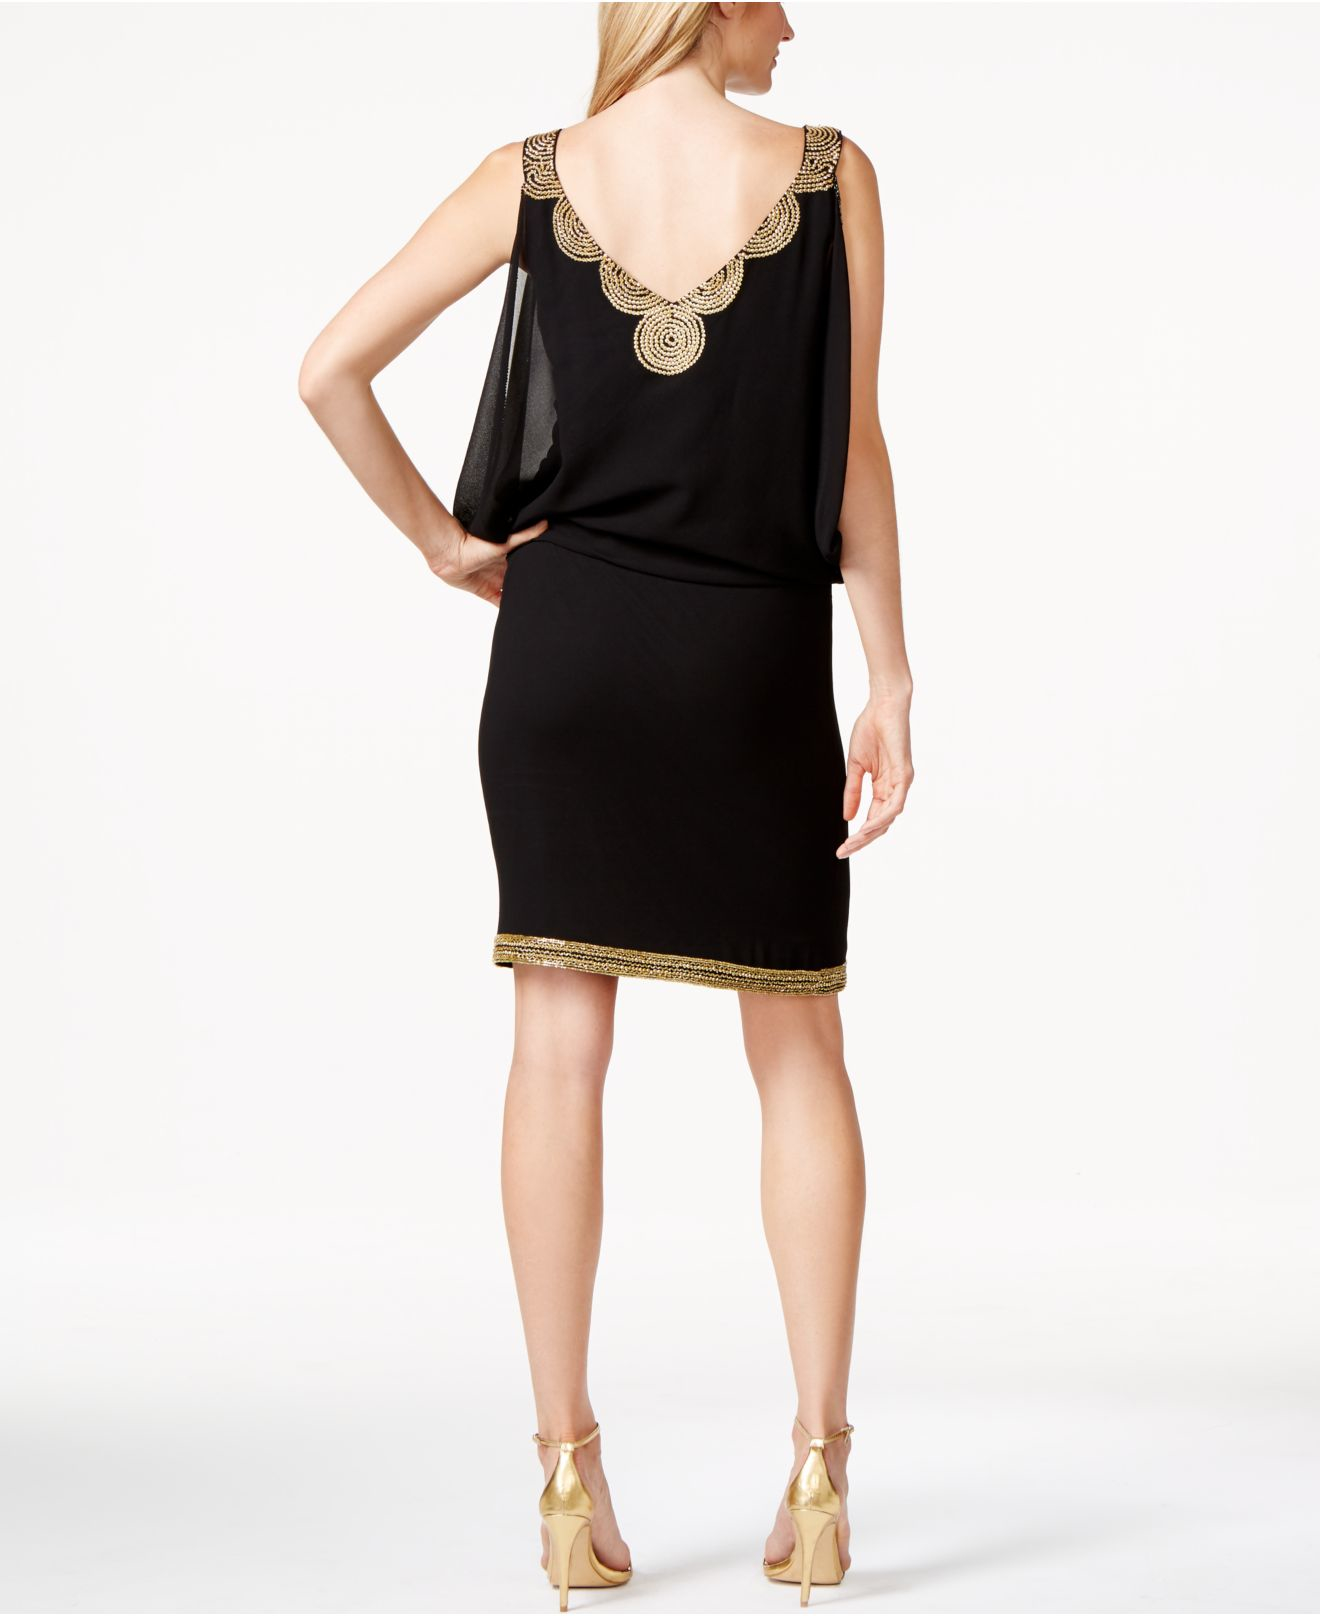 j kara beaded cocktail dress in black lyst